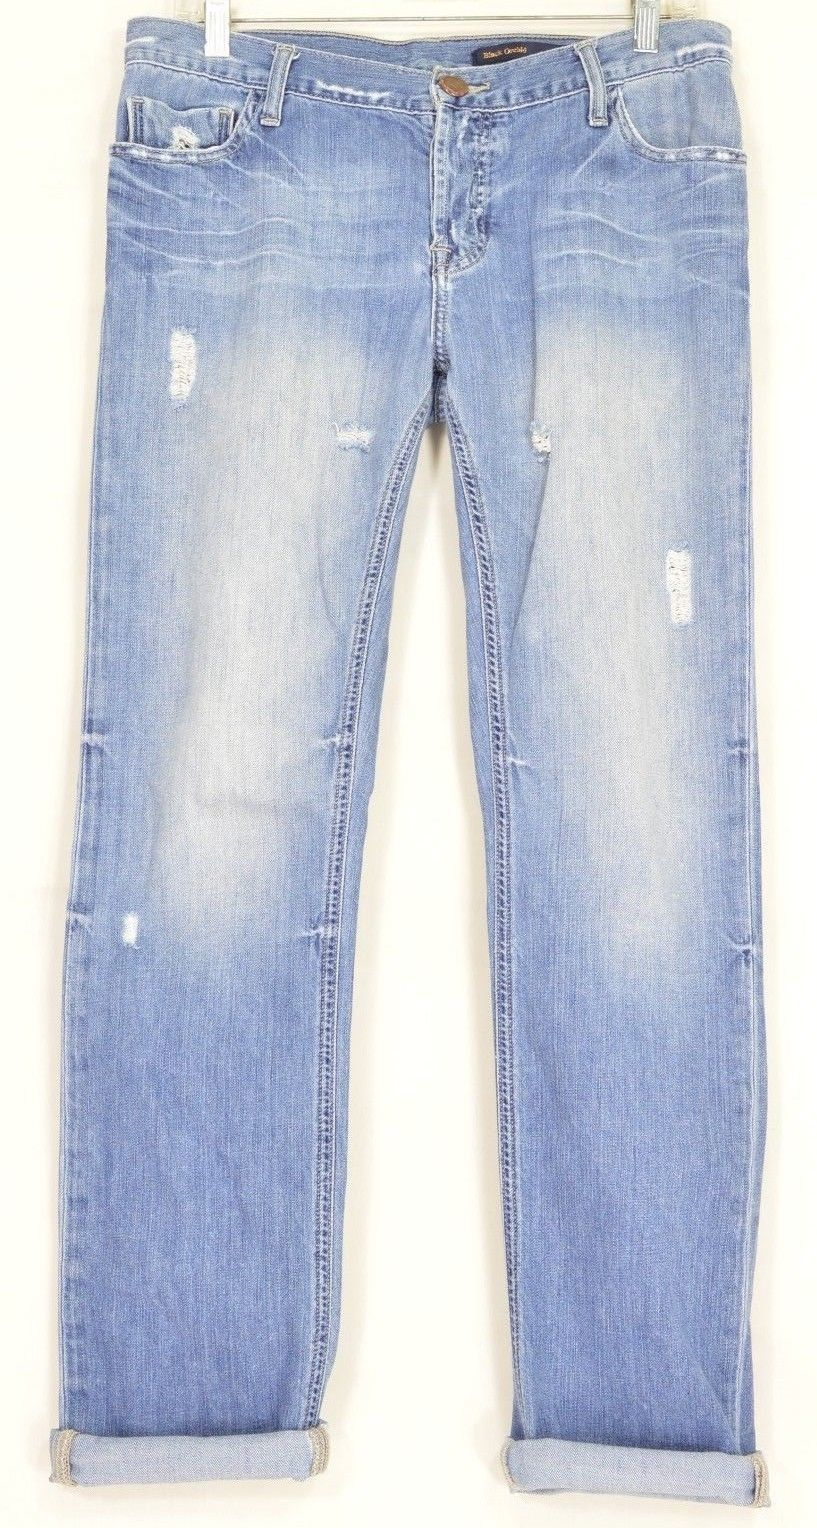 Black Orchid jeans 29 x 32 100% cotton USA boyfriend destroyed button fly